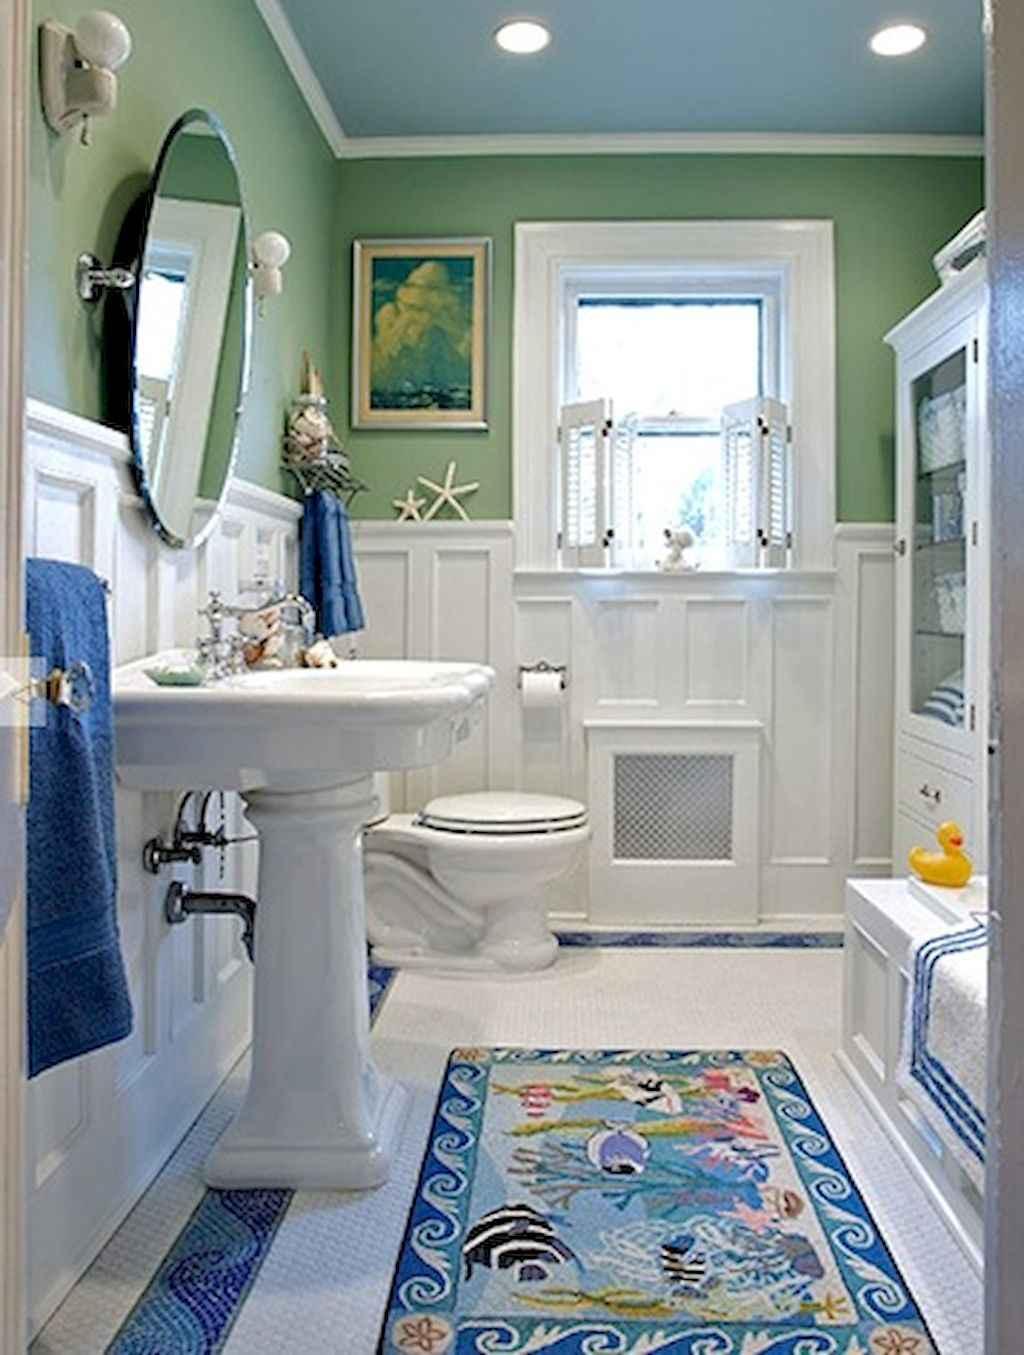 Awesome Coastal Style Nautical Bathroom Designs Ideas (32)